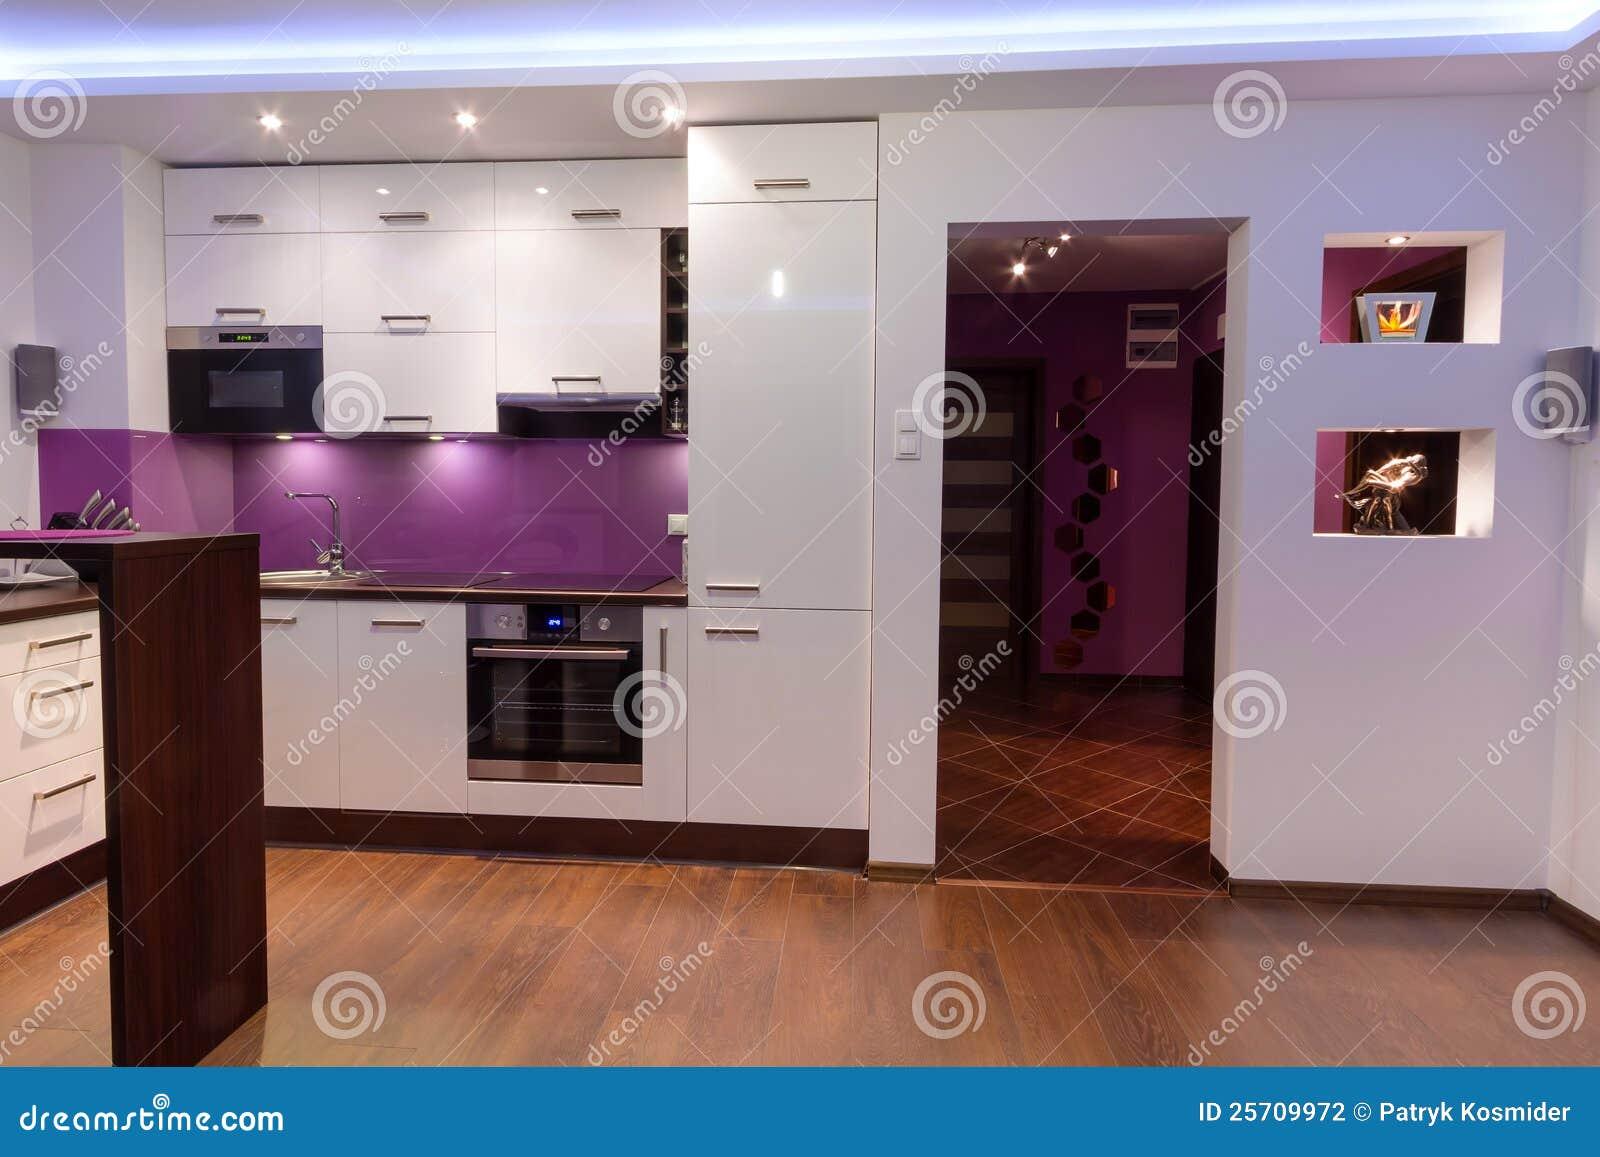 Moderne woonkamer met keuken stock fotografie beeld 25709972 - Woonkamer met keuken geopend ...